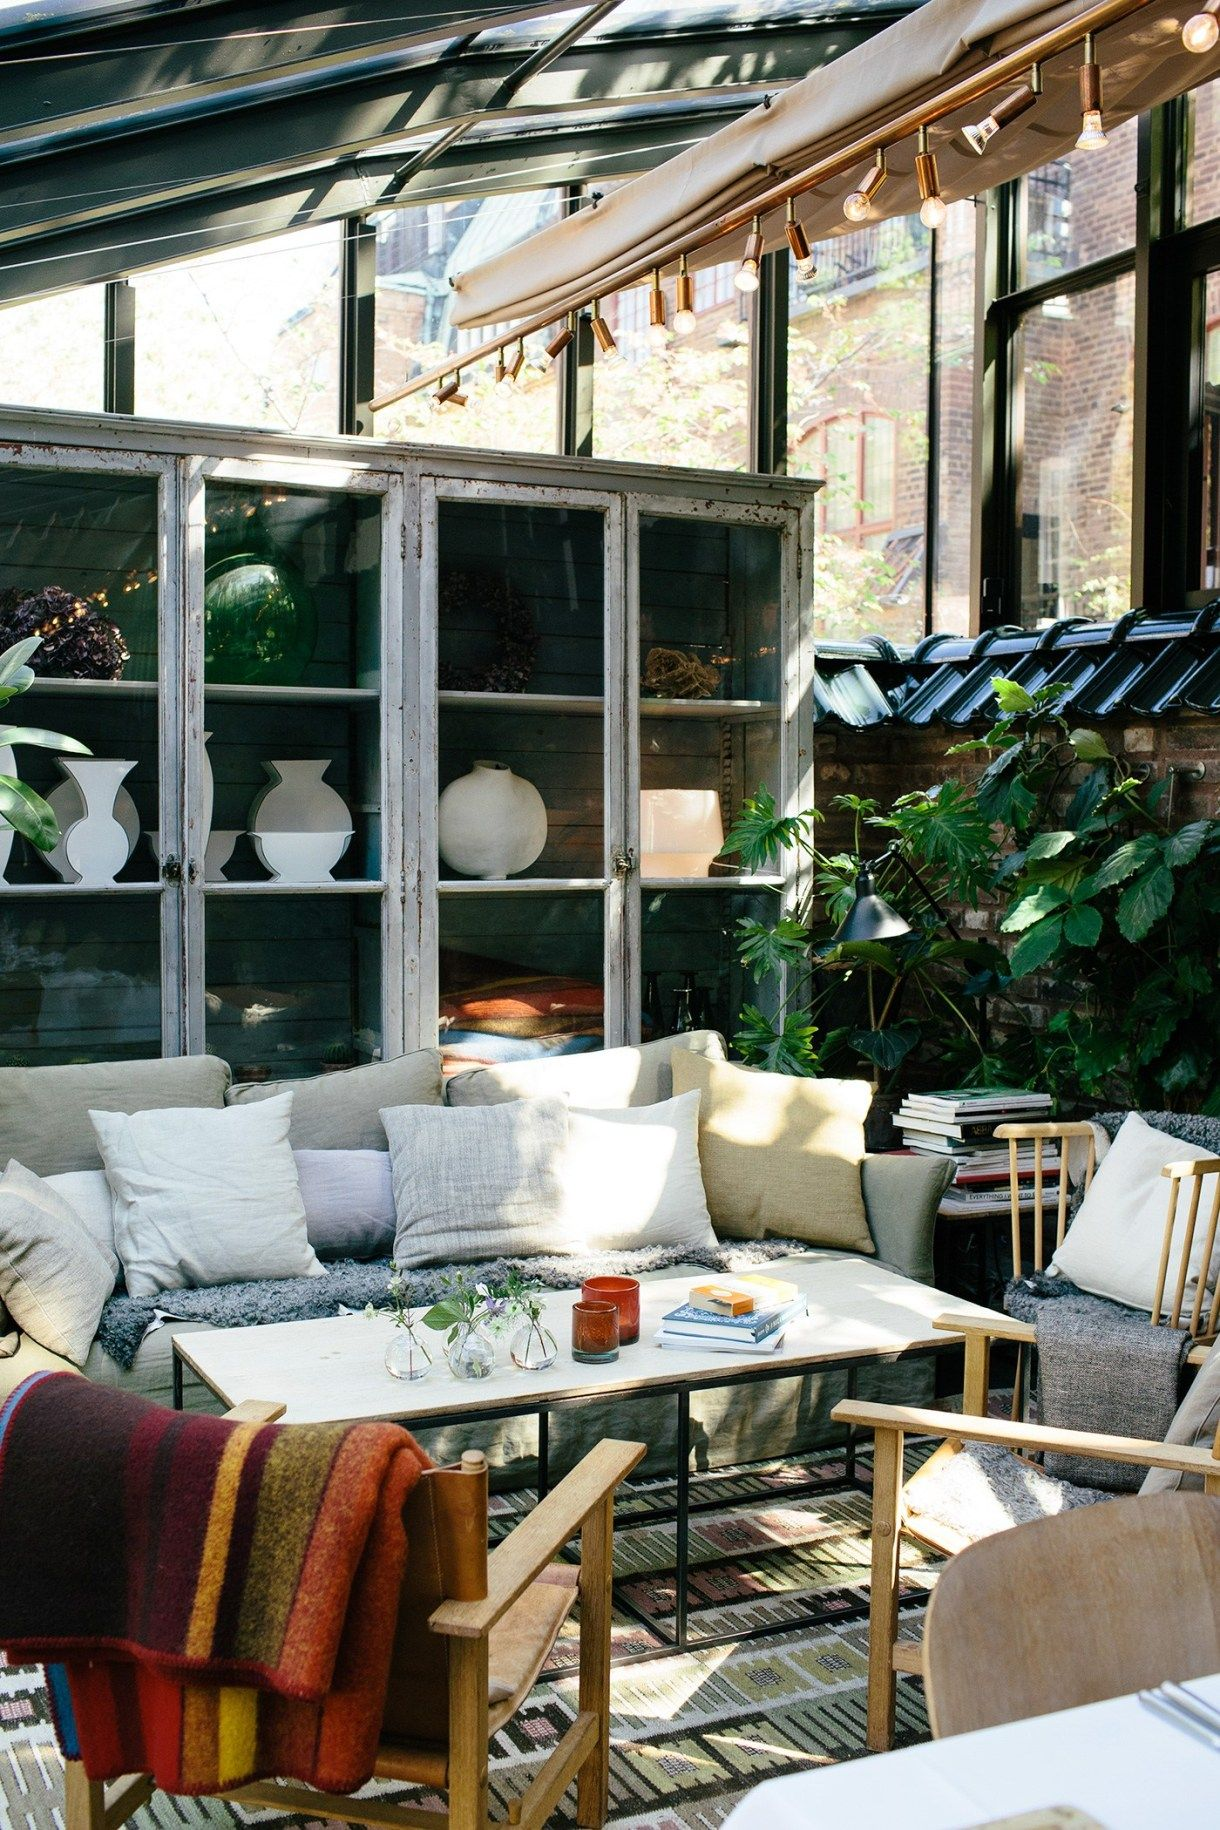 Ett Hem Map & Menu in 2020 Home, Home decor, Interior